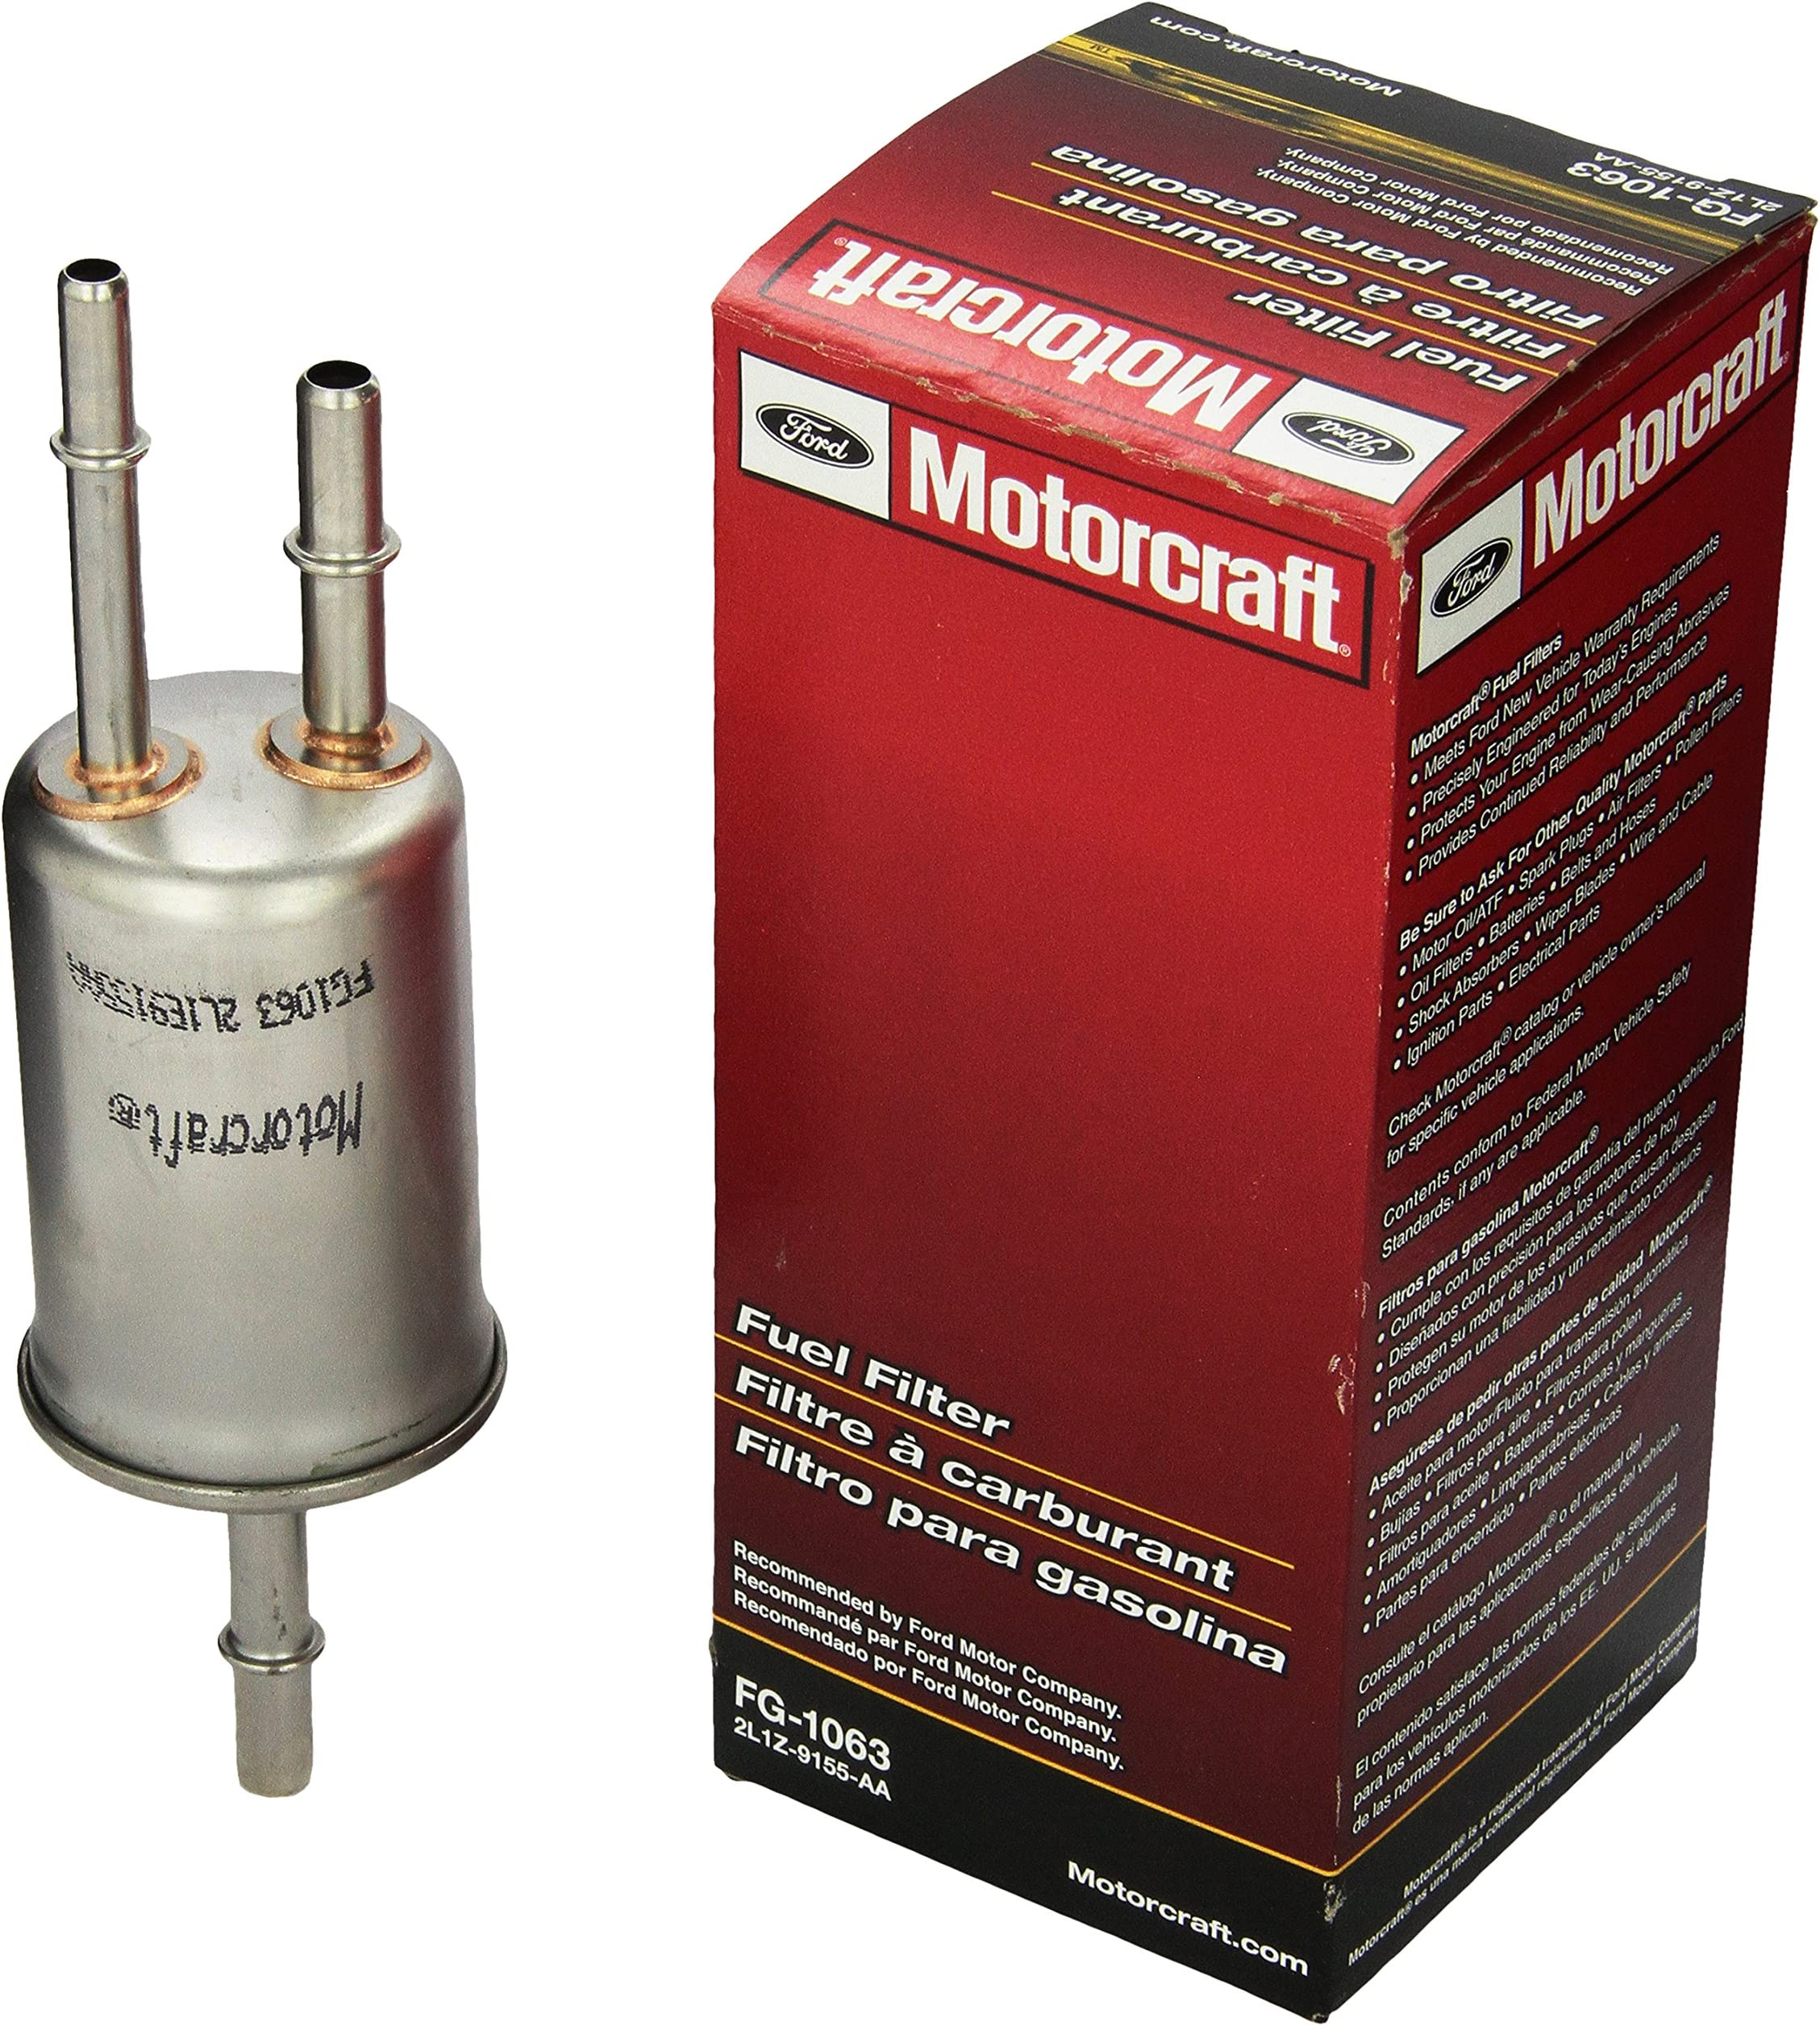 Amazon.com: Motorcraft - FG1063 Fuel Filter: AutomotiveAmazon.com